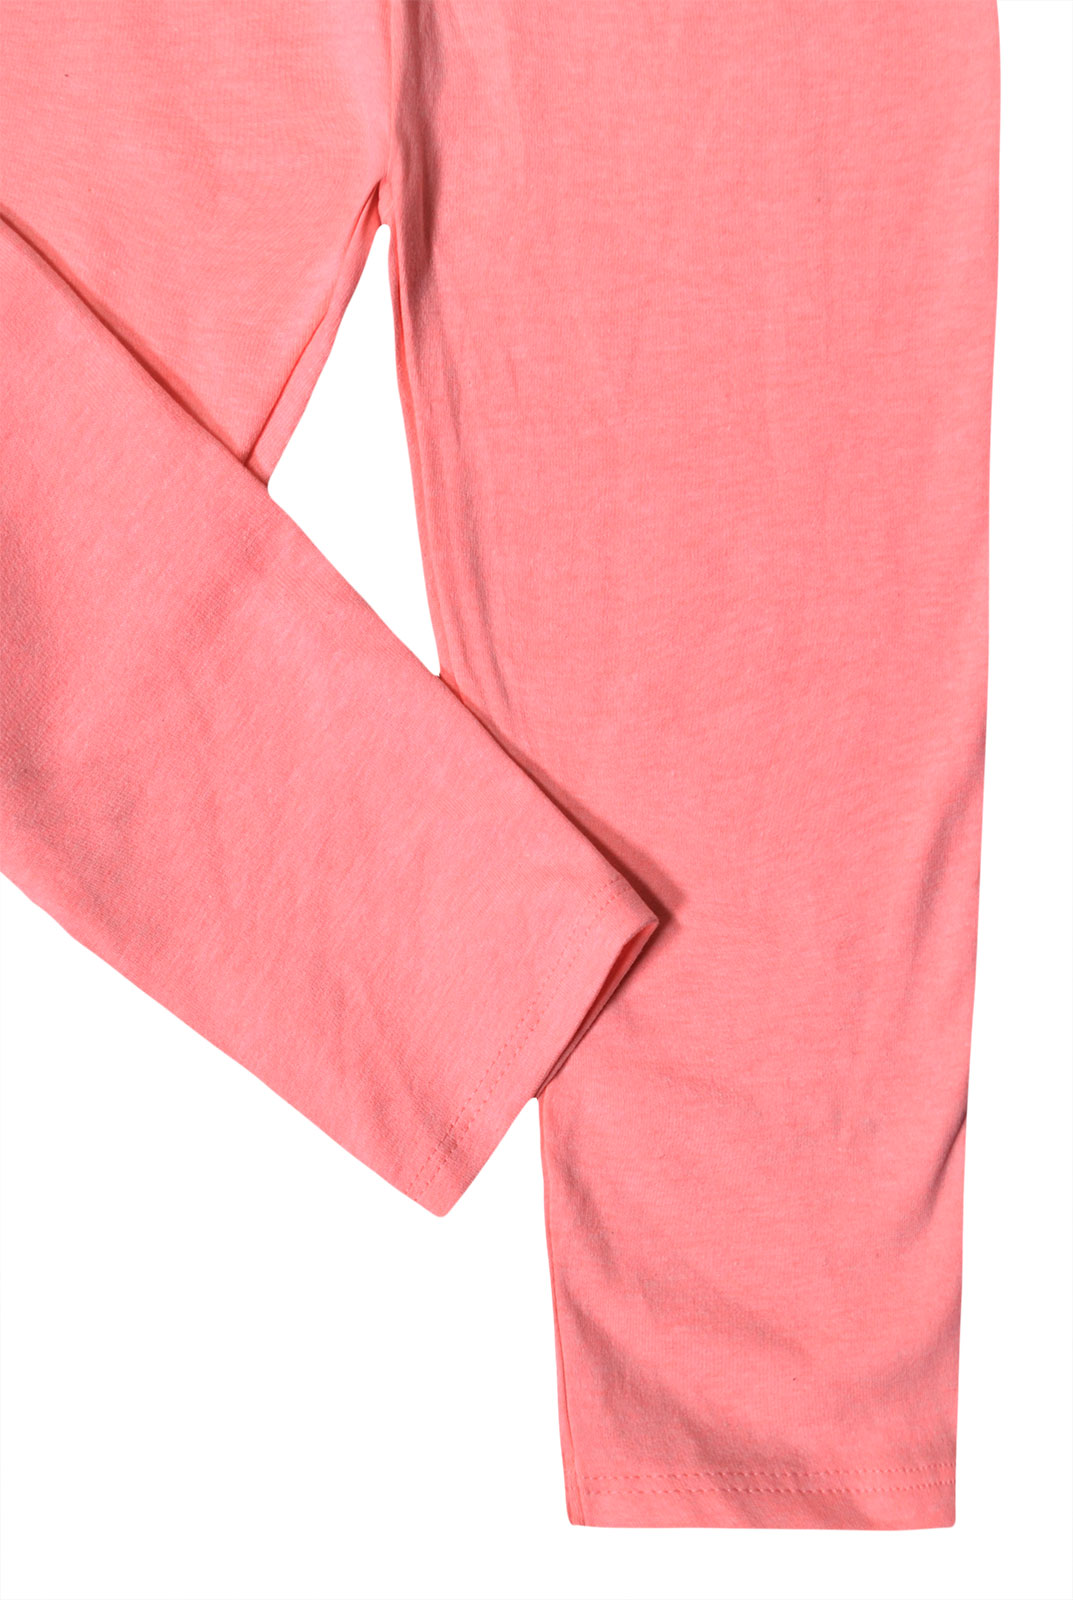 Girls-Next-Leggings-Kids-New-Pants-Age-2-3-4-5-6-7-8-9-10-11-12-13-14-15-16-Yrs thumbnail 13